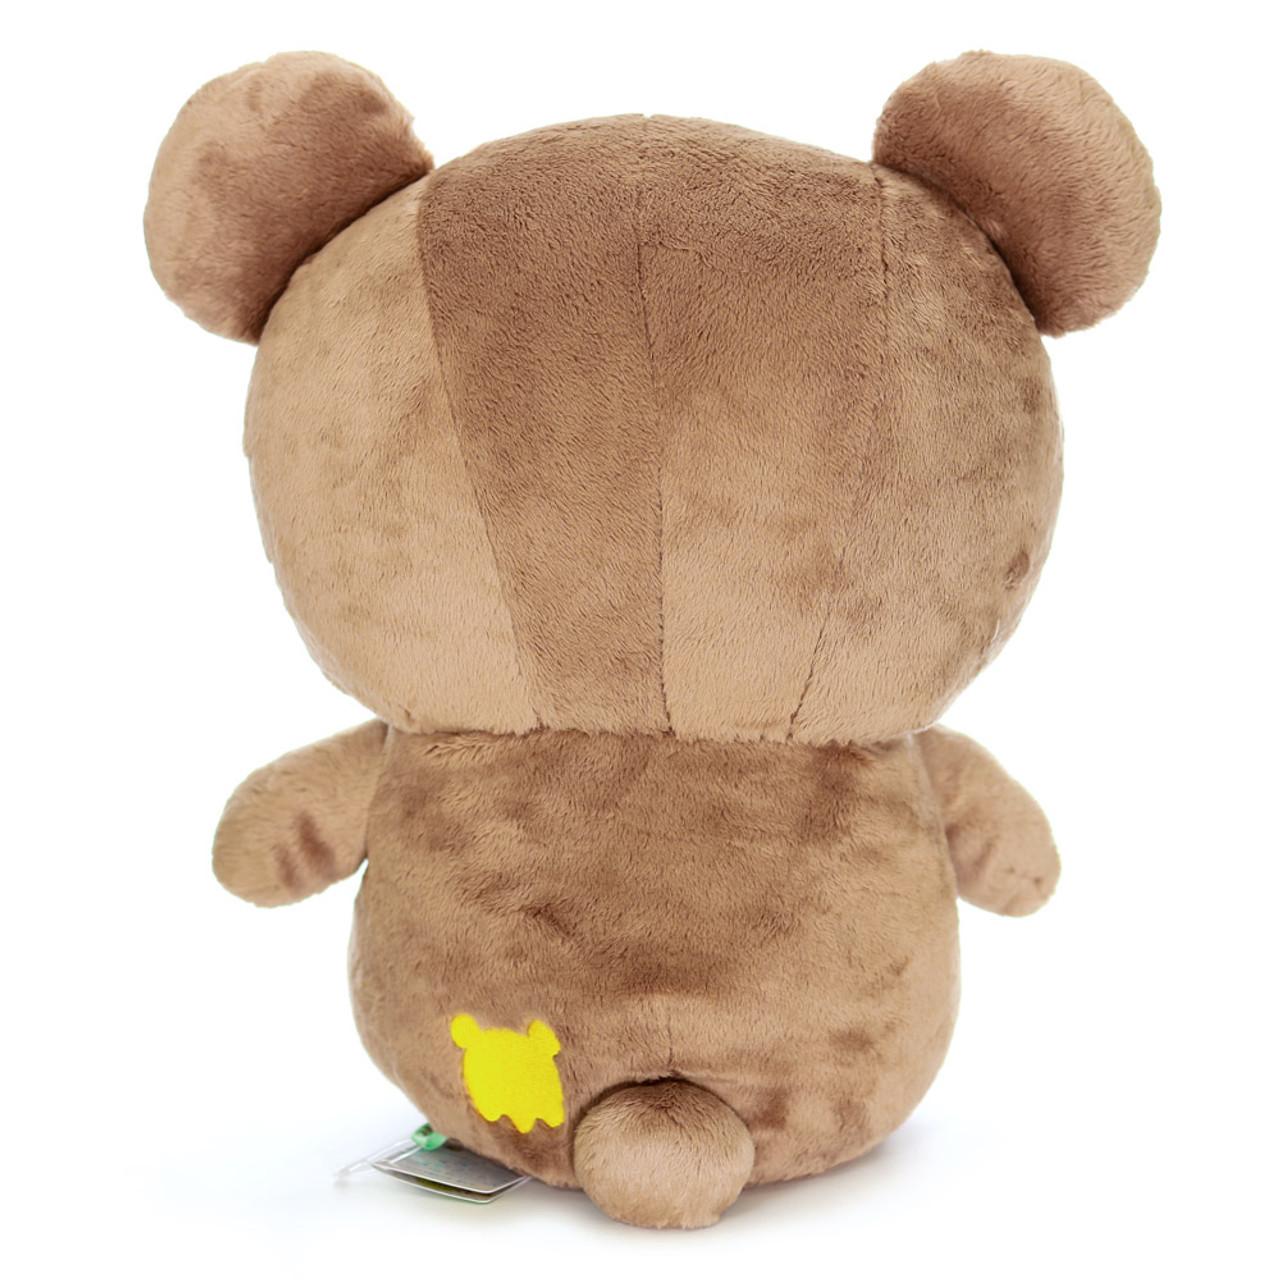 San-x Cute Sweet Chairoikoguma Bear Stuffed Animal Toy L MR94401 ( Back View )